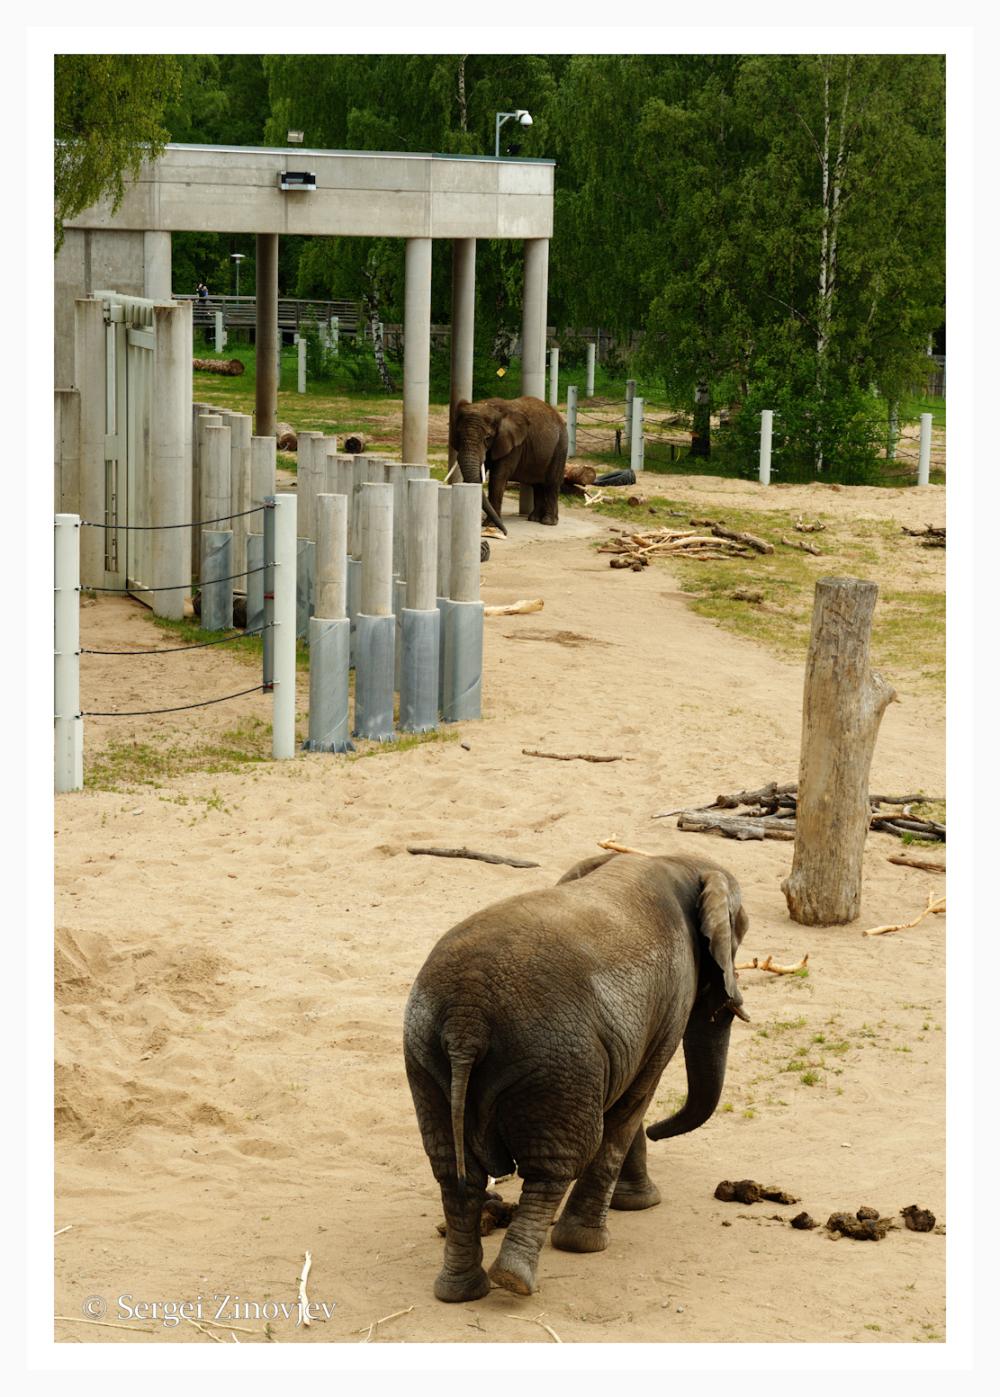 elephants from Tallinn Zoo.